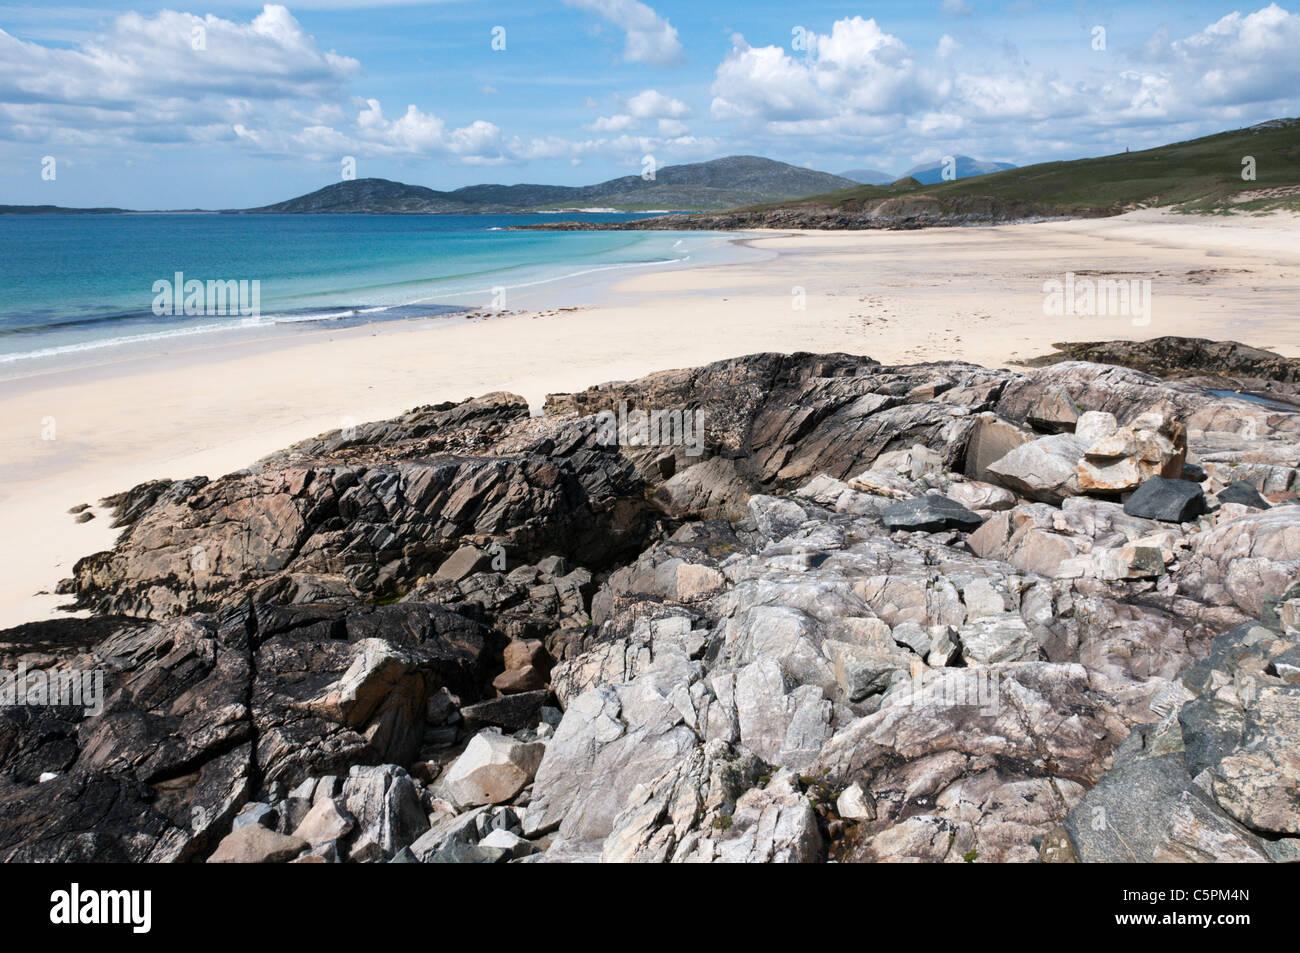 The island of Taransay seen across Traigh Iar beach on South Harris in the Outer Hebrides. - Stock Image